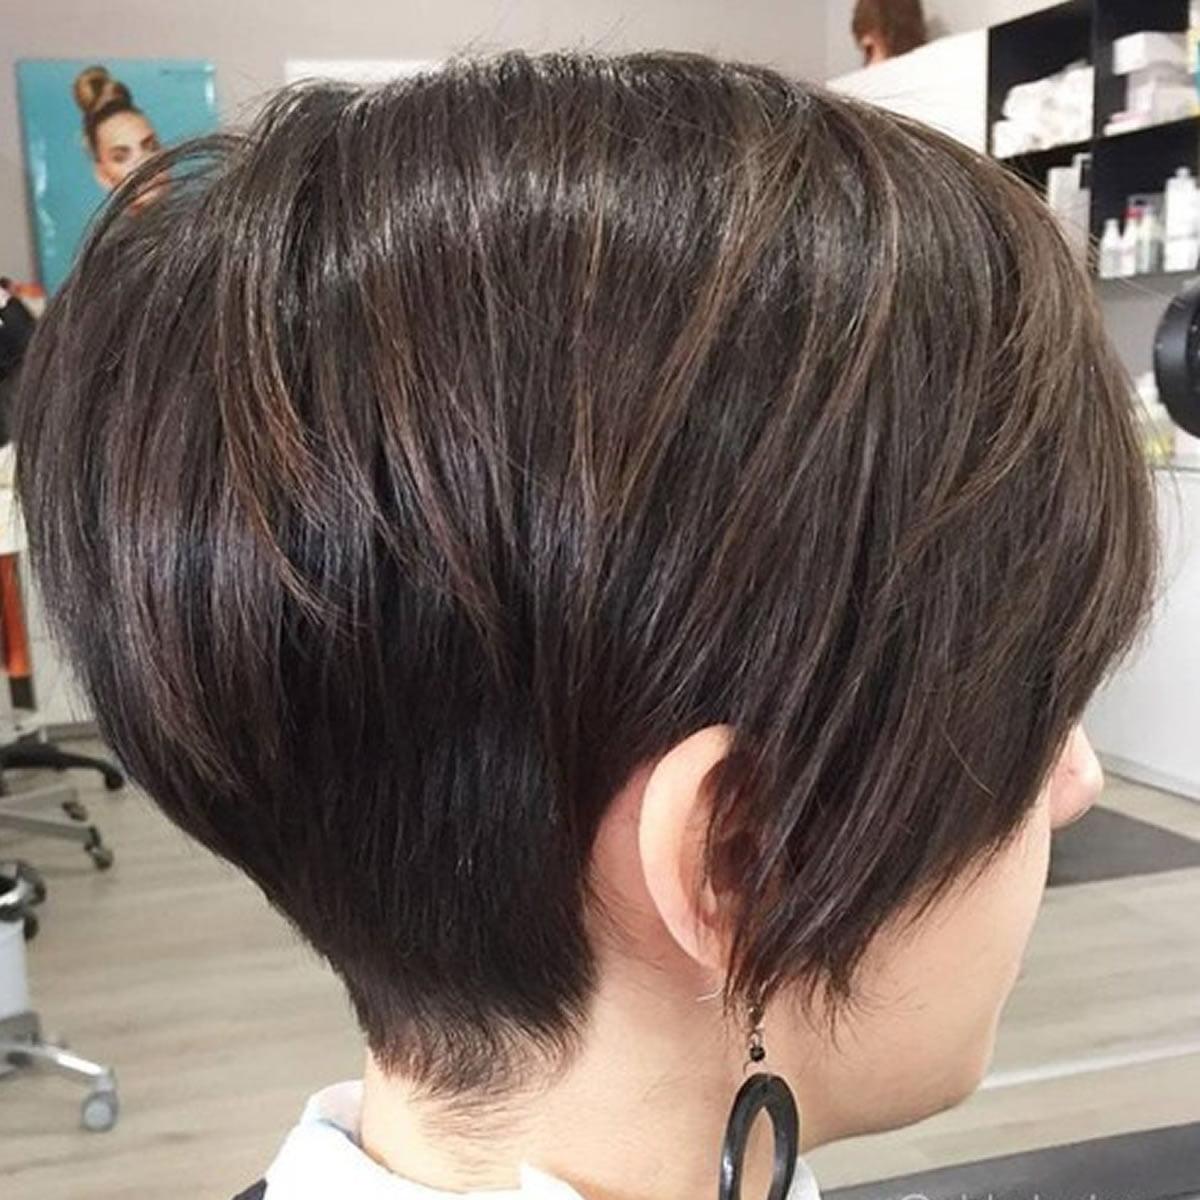 new short haircut